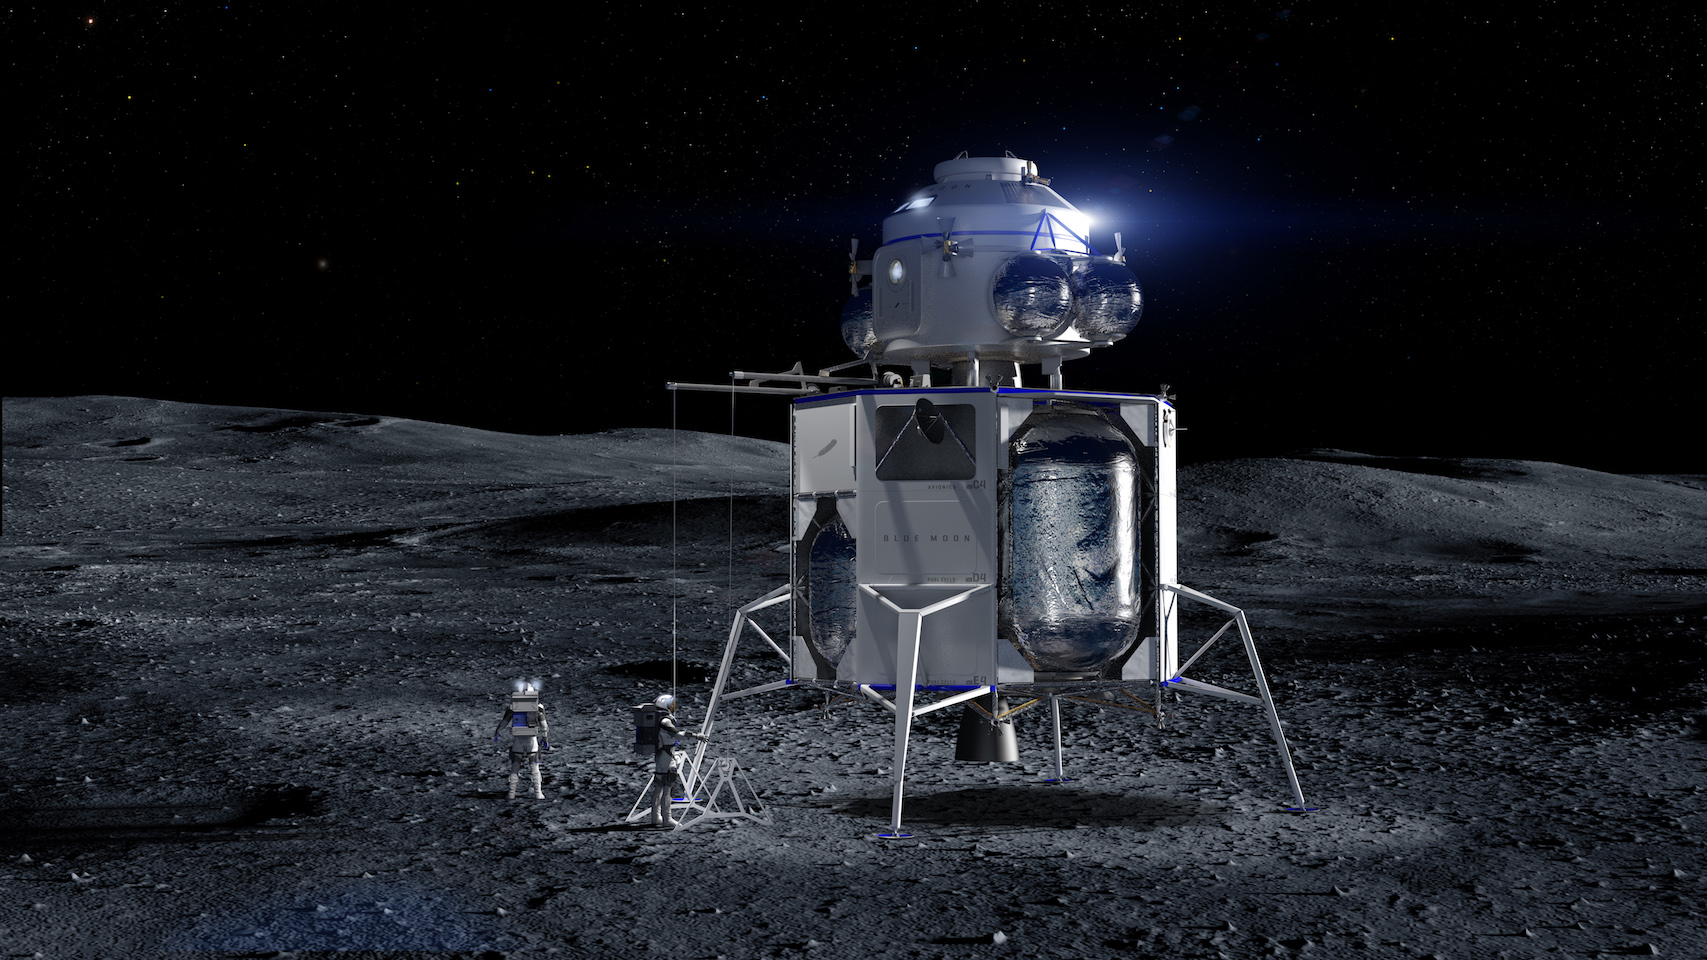 BLUE ORIGIN BLUE MOON NASA HUMAN LANDING SYSTEM VEHICLE